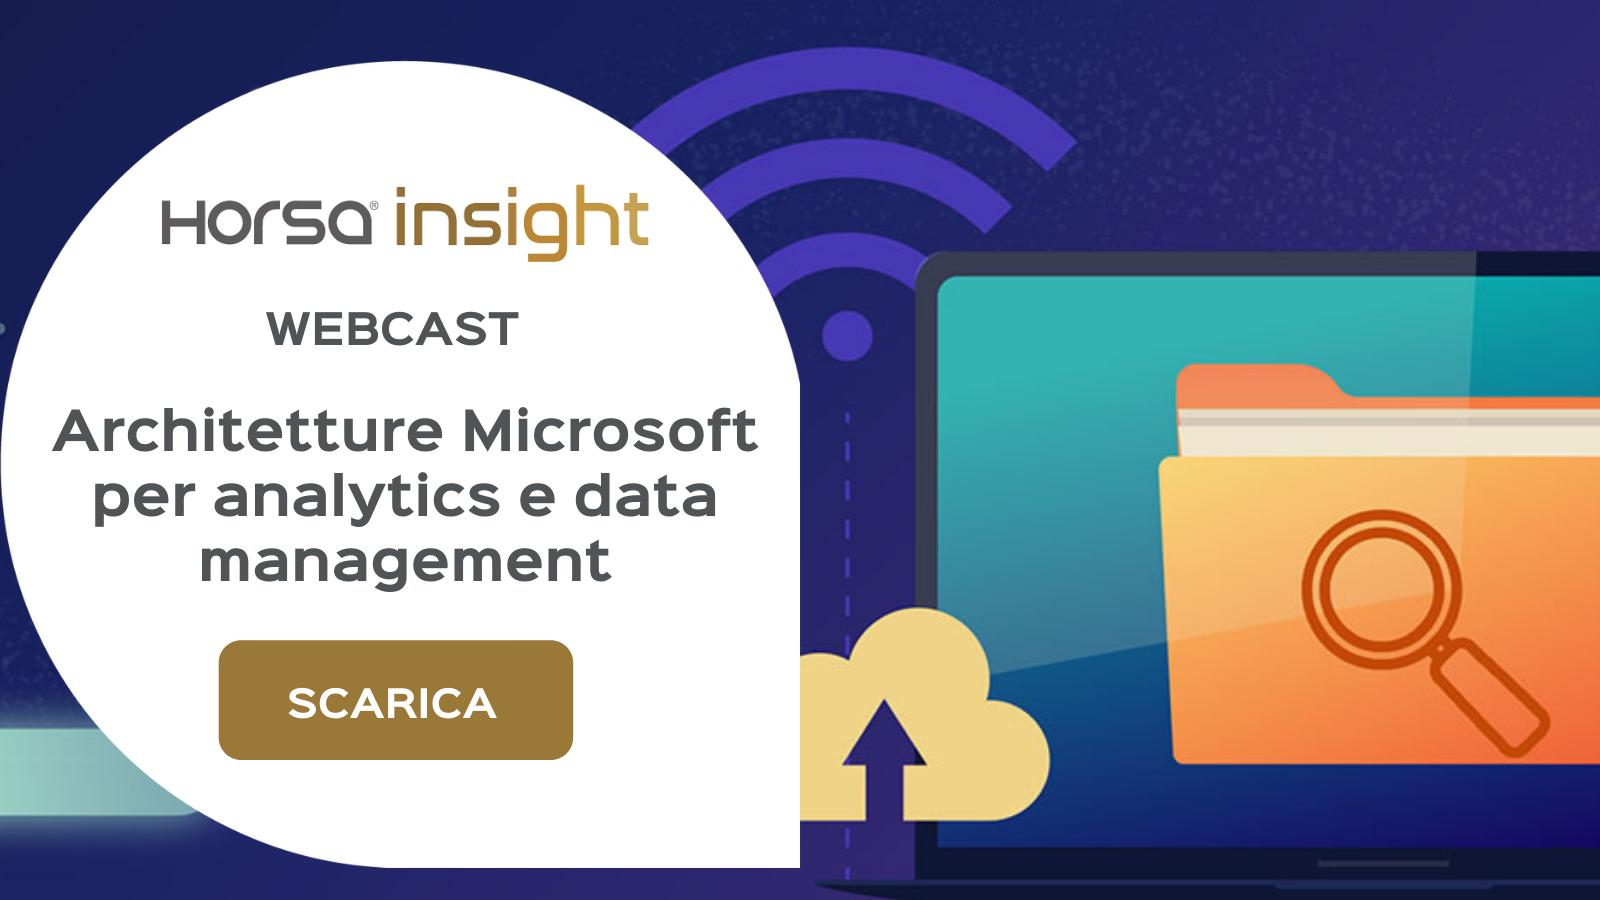 Horsa Insight - Webcast - Architetture Microsoft per analytics e data management